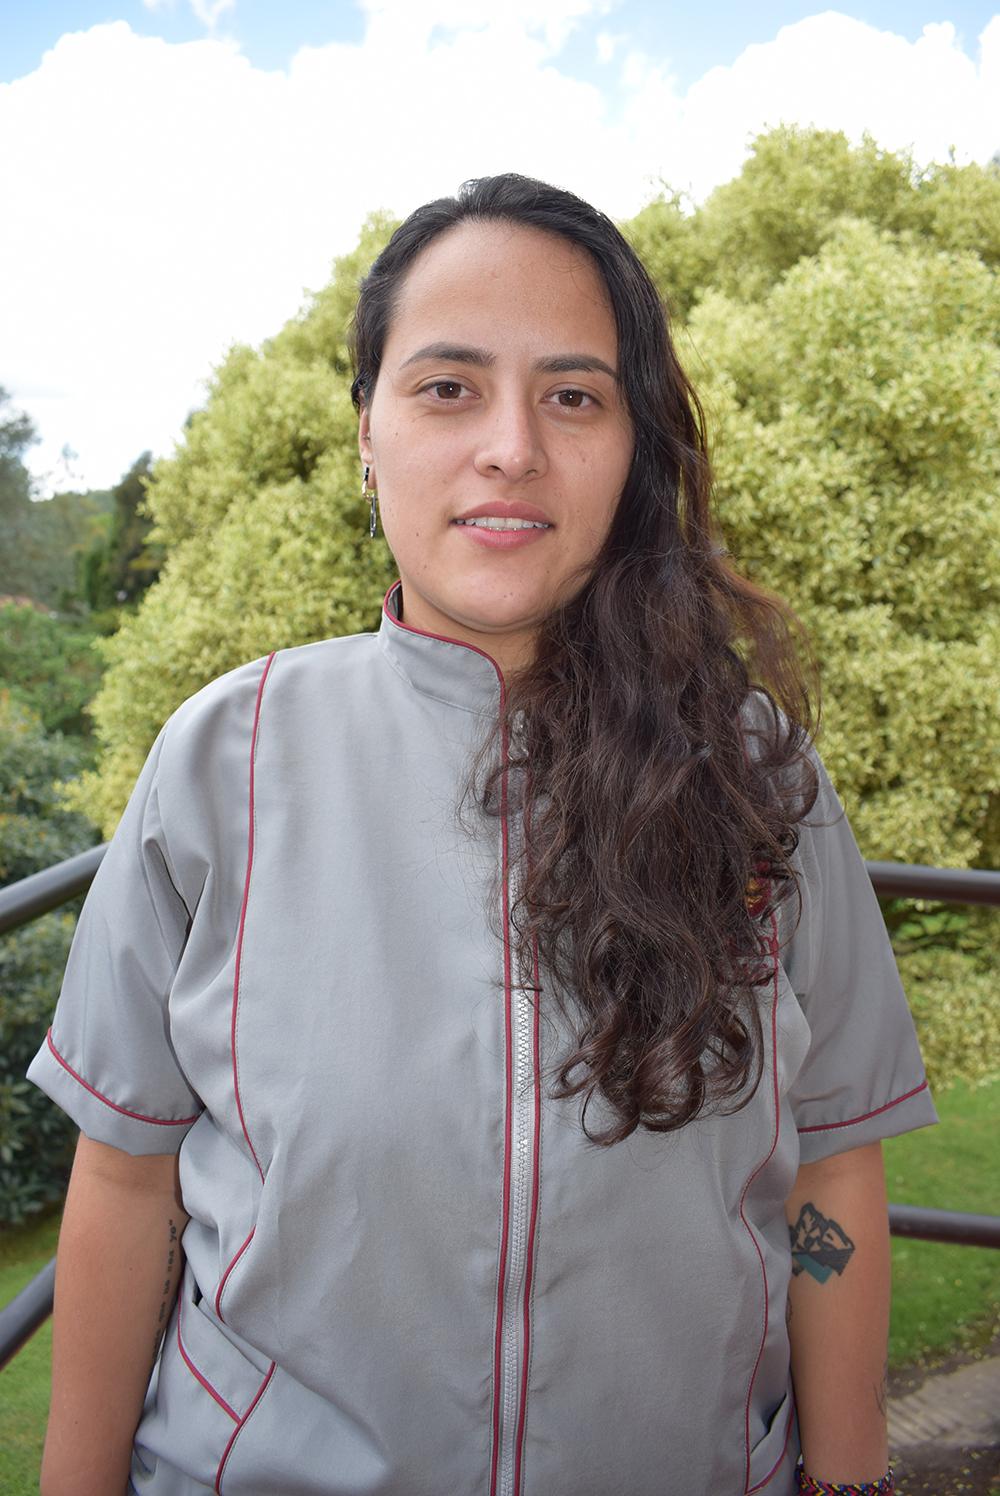 Stefanye Franco